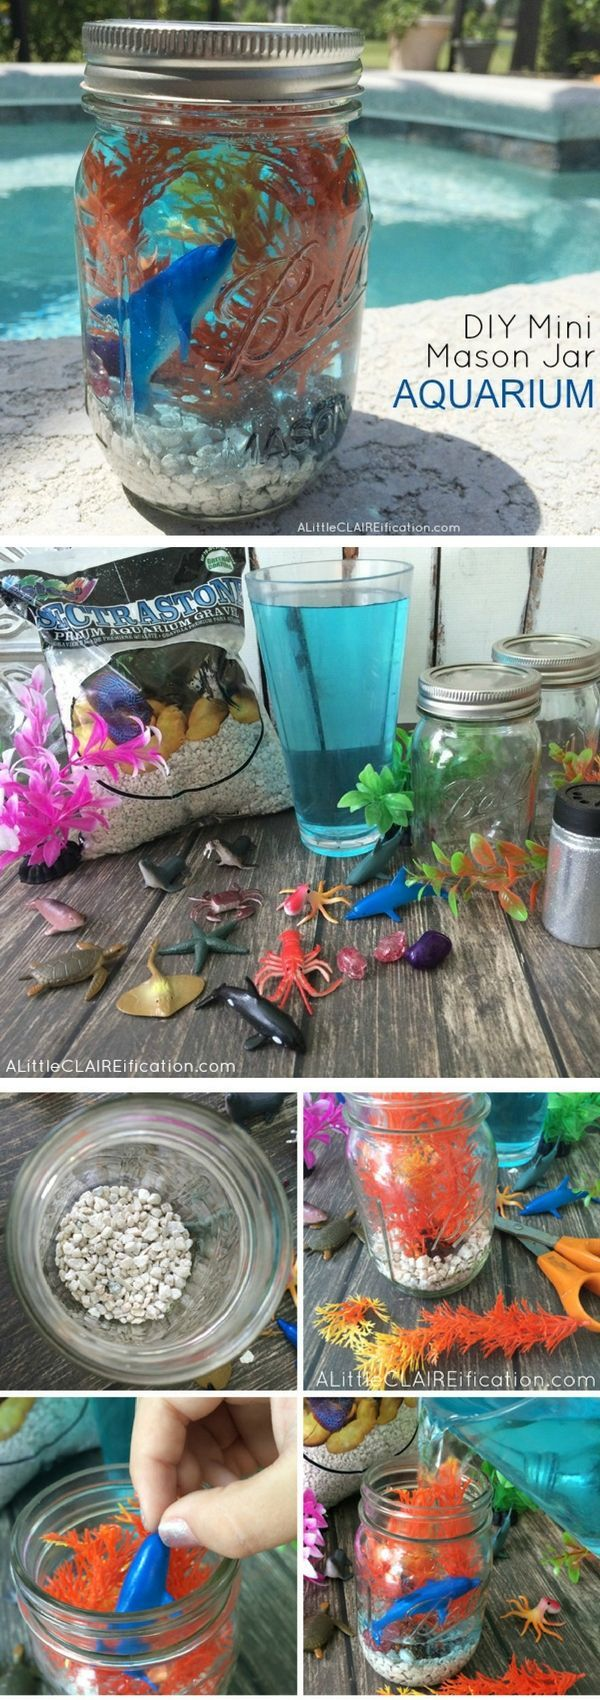 most awesome diys you can make with mason jars mini aquarium